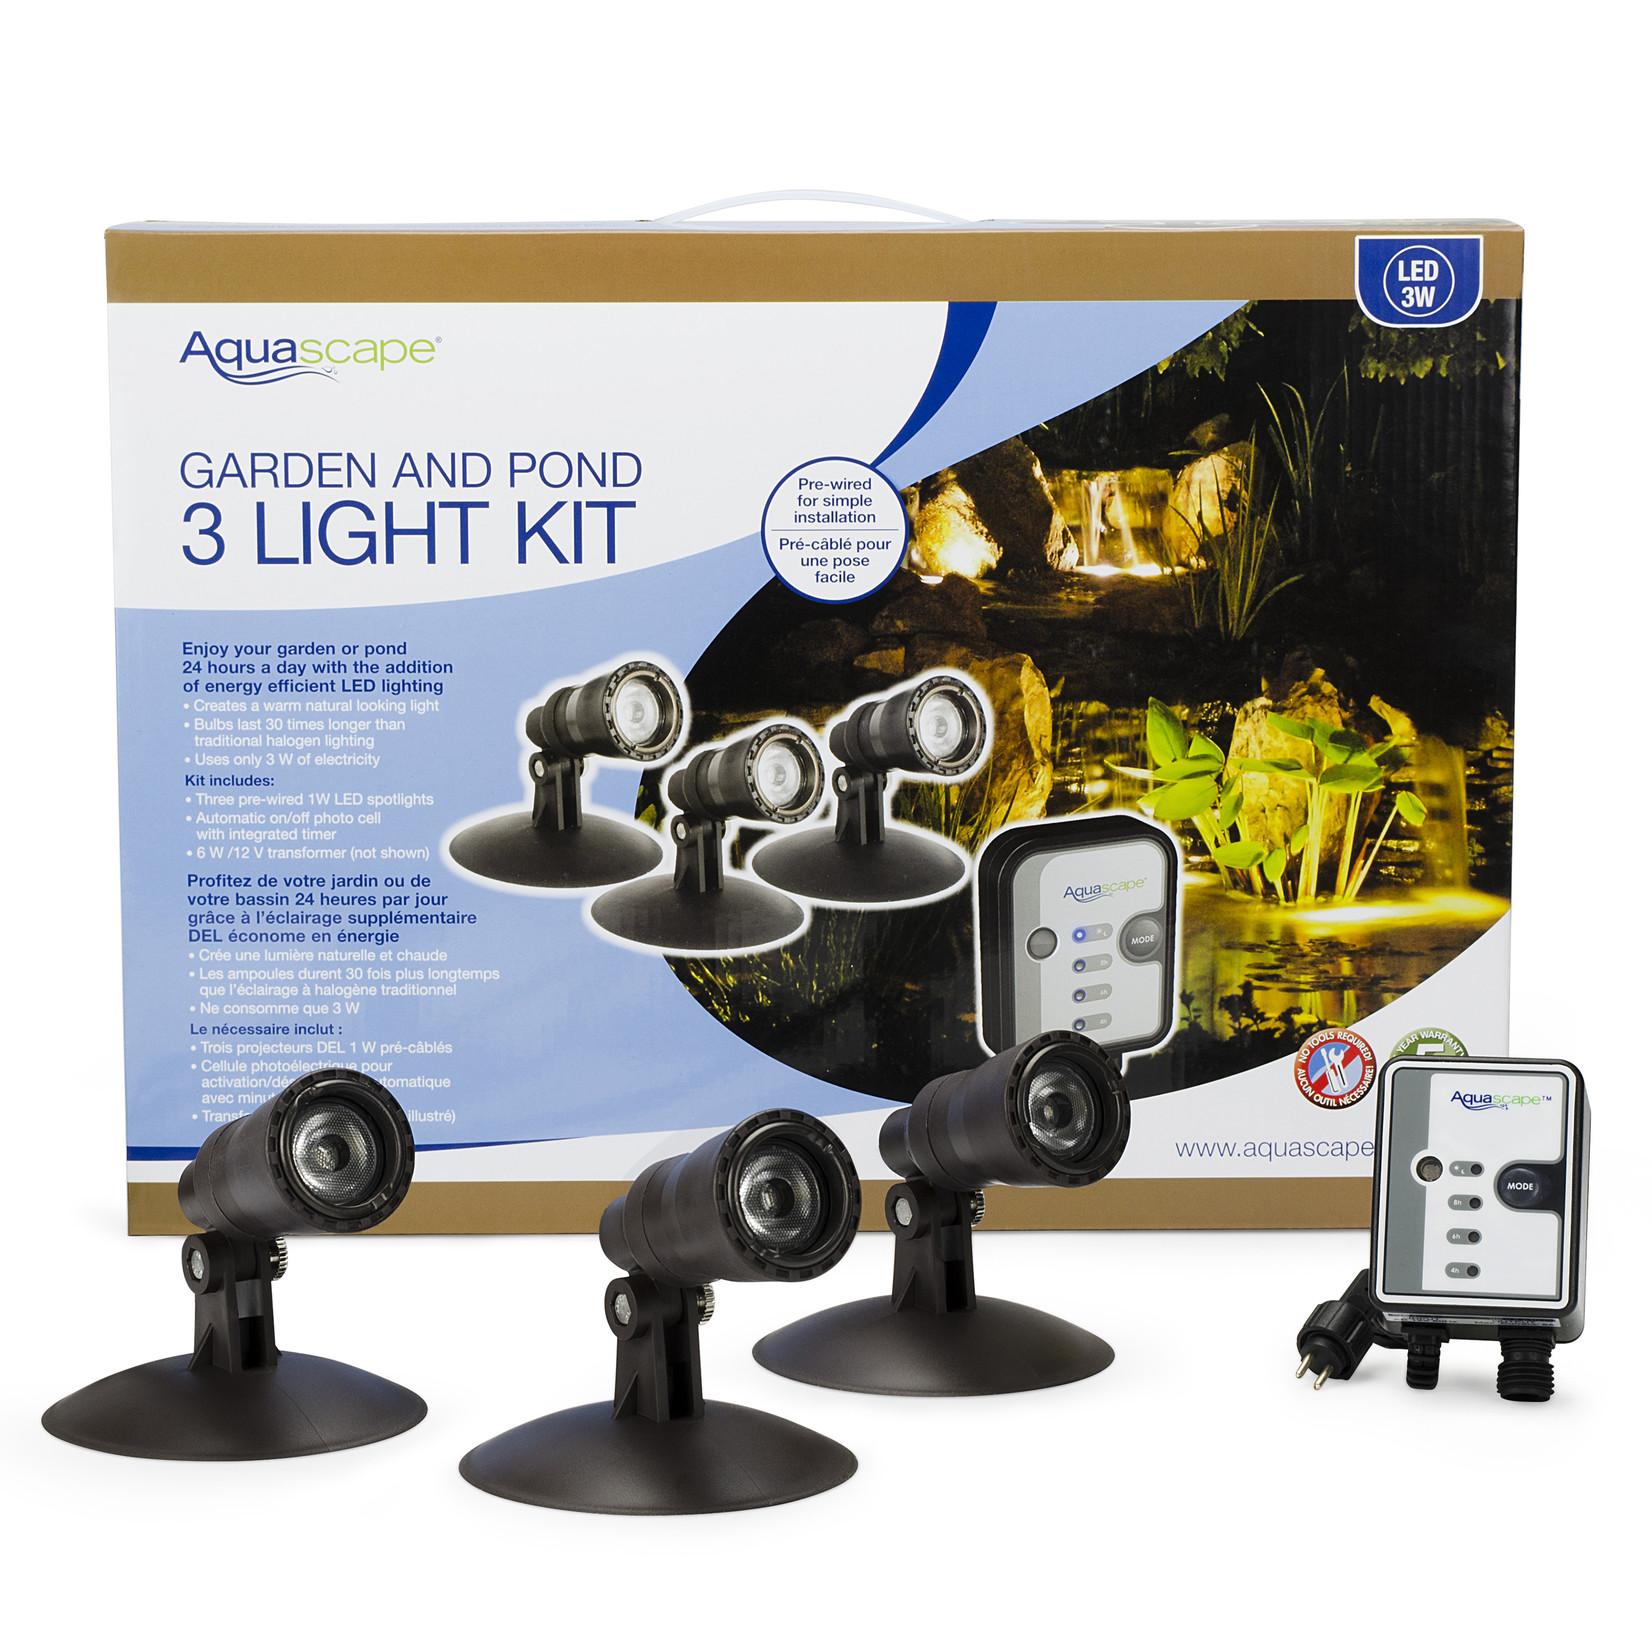 Aquascape Led Pond and Landscape Light Kit